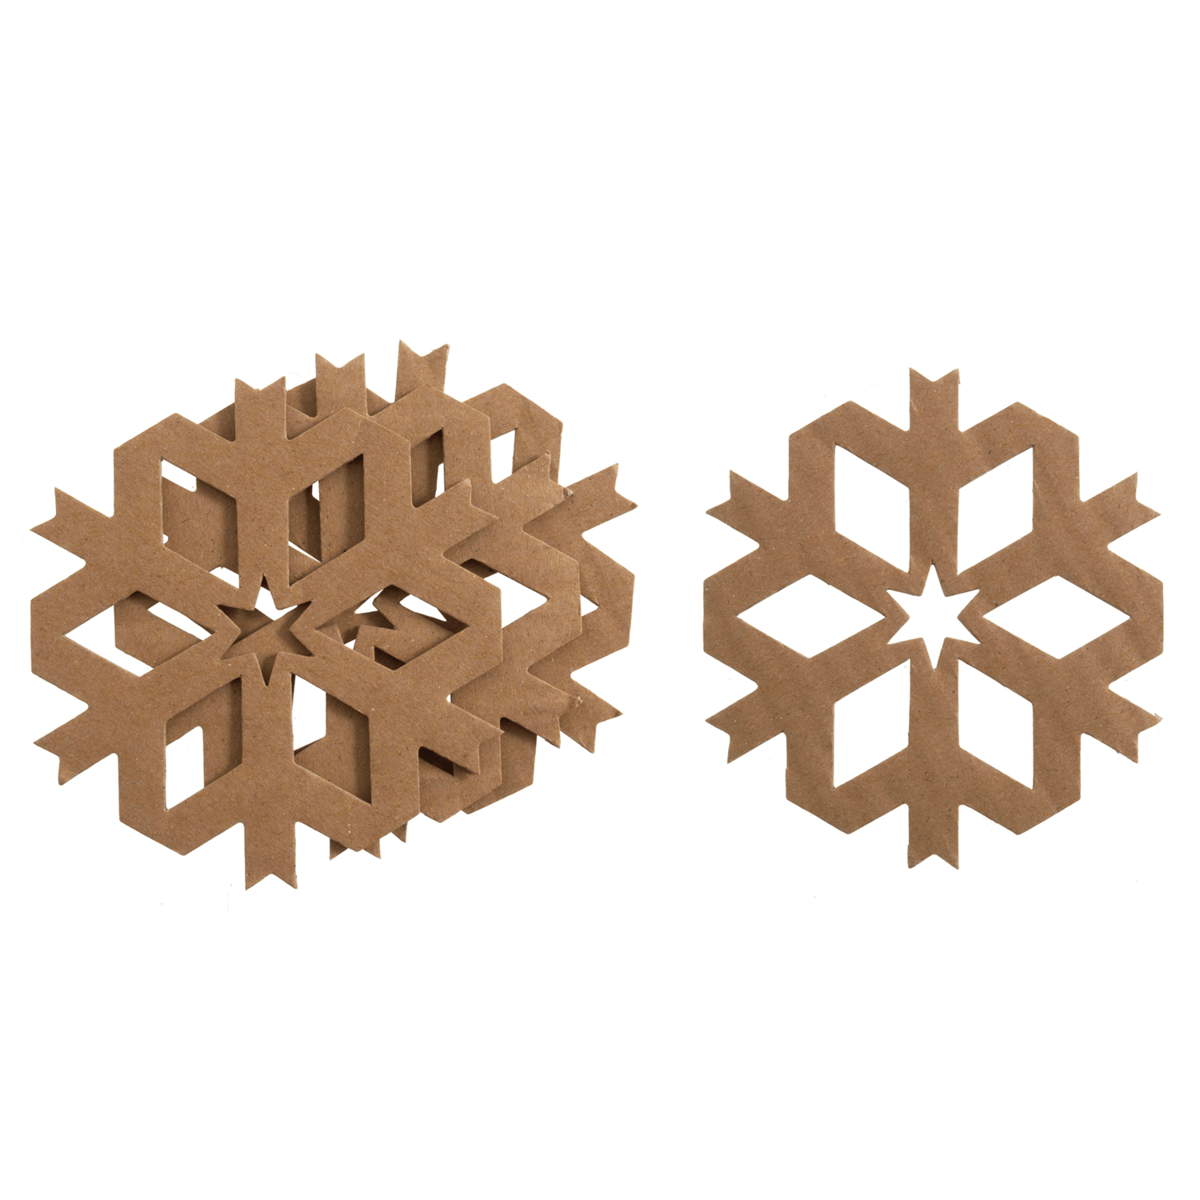 4 x Christmas Die Cut Snowflakes Embellishments Craft